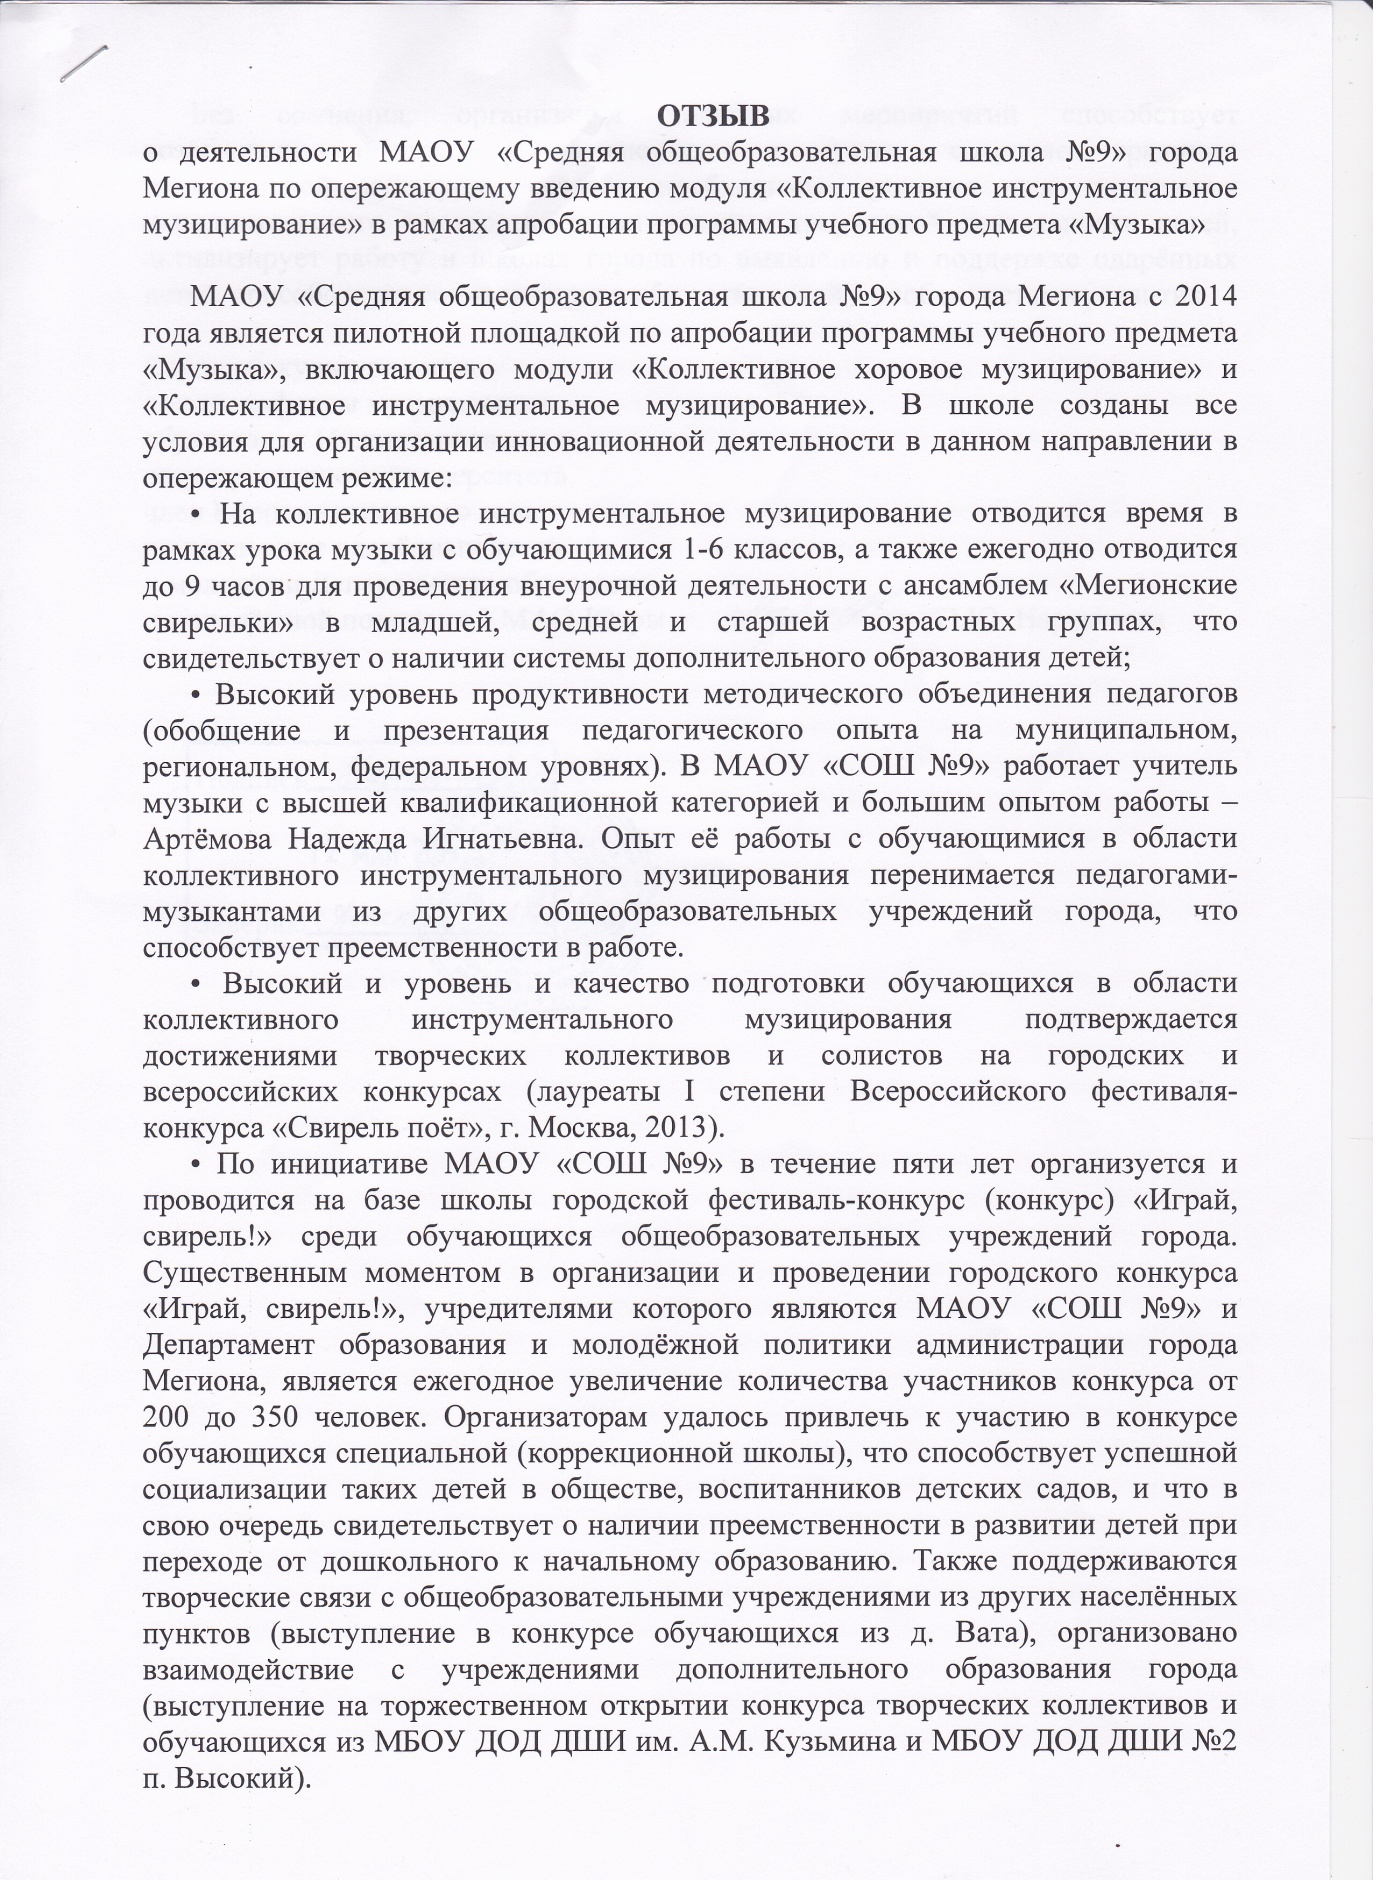 F:\IRINA\МАОУ_СОШ №9\грант-музыка\готовые документы\2014_05_15\IMG_0004.jpg